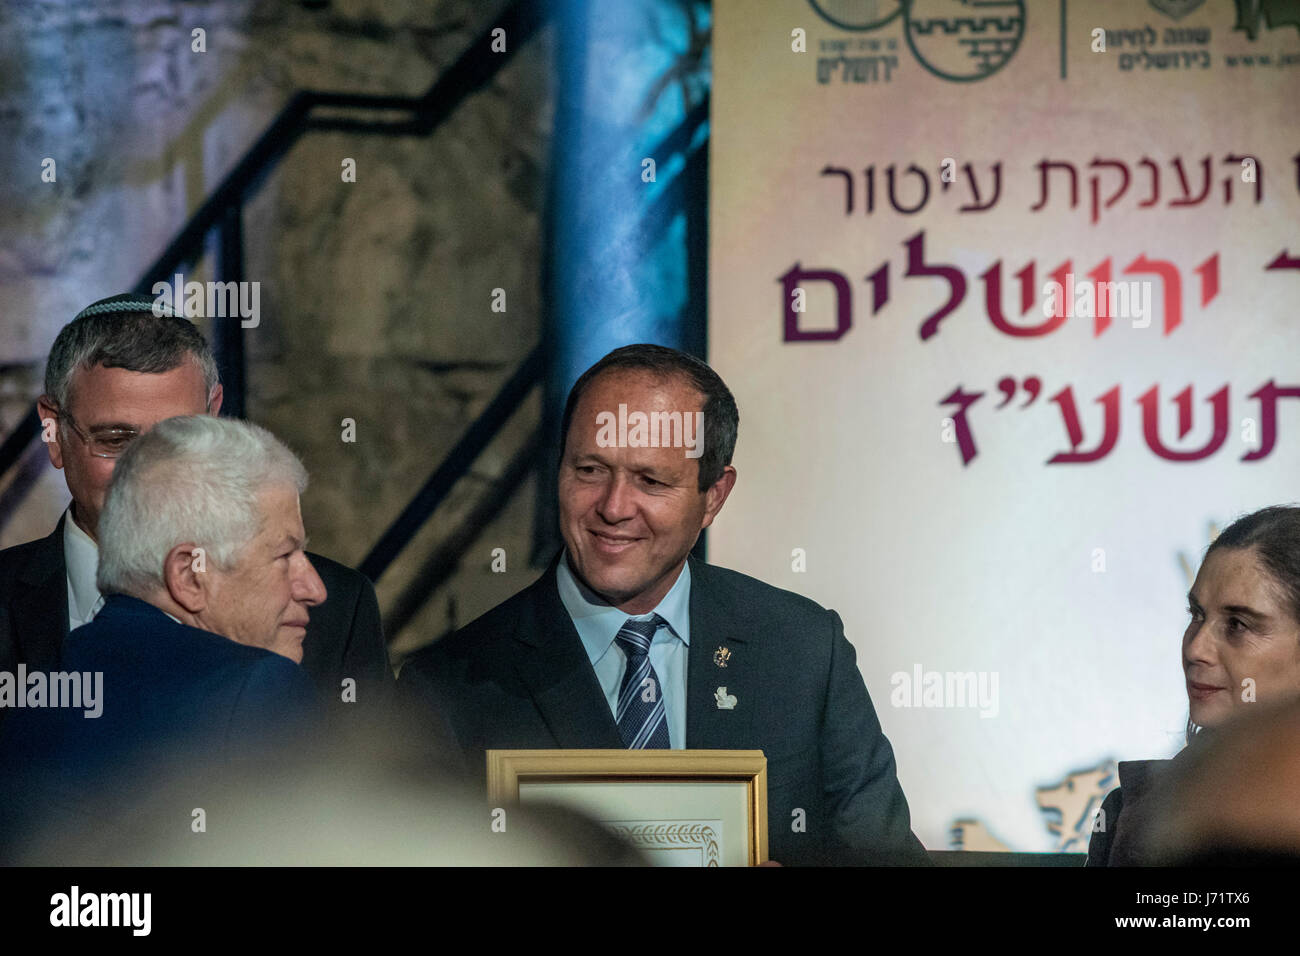 Jerusalem, Israel. 22nd May, 2017. Jerusalem's mayor Nir Barkat presents a merit certificate to Prof. Khalil - Stock Image